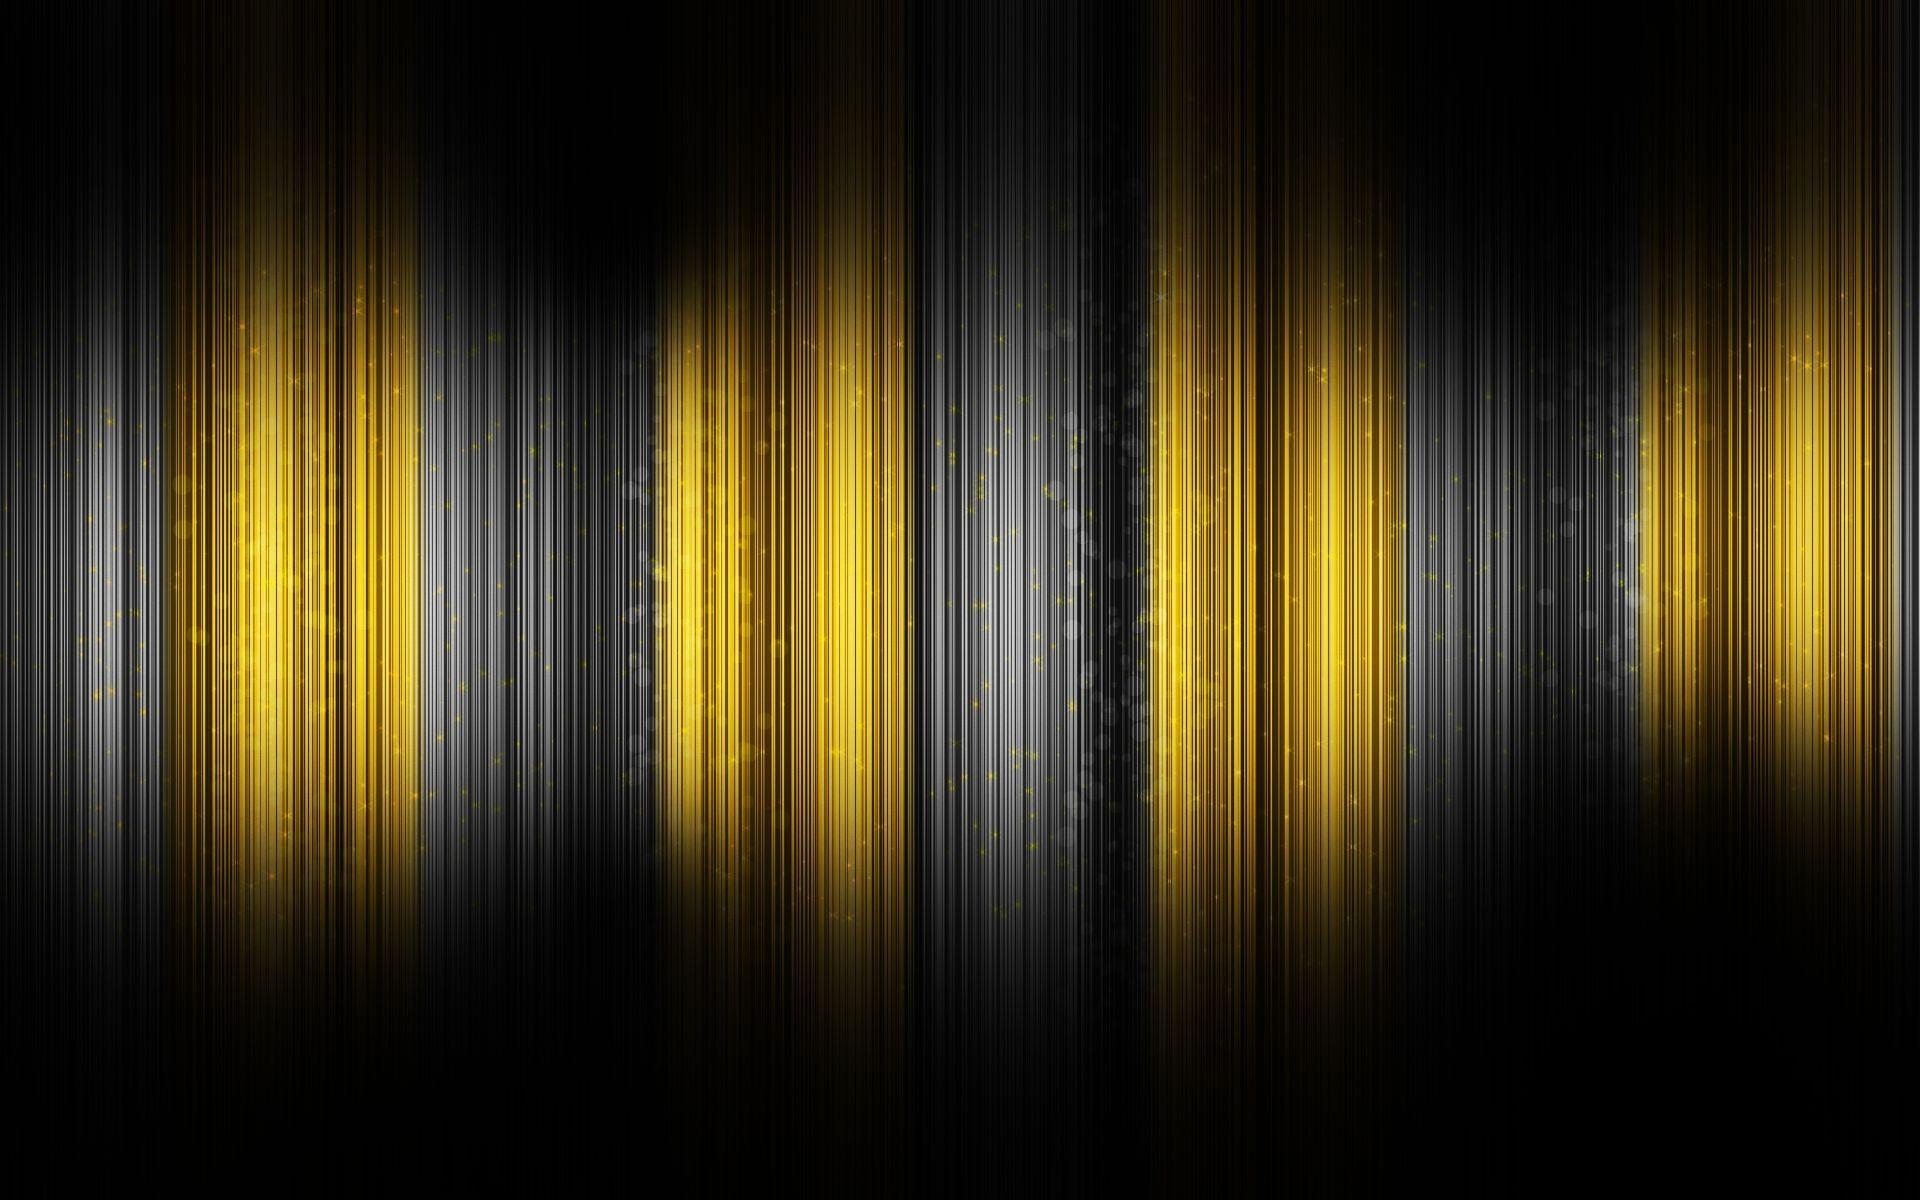 Arathorn Jones – gold abstract wallpaper – 1920 x 1200 px